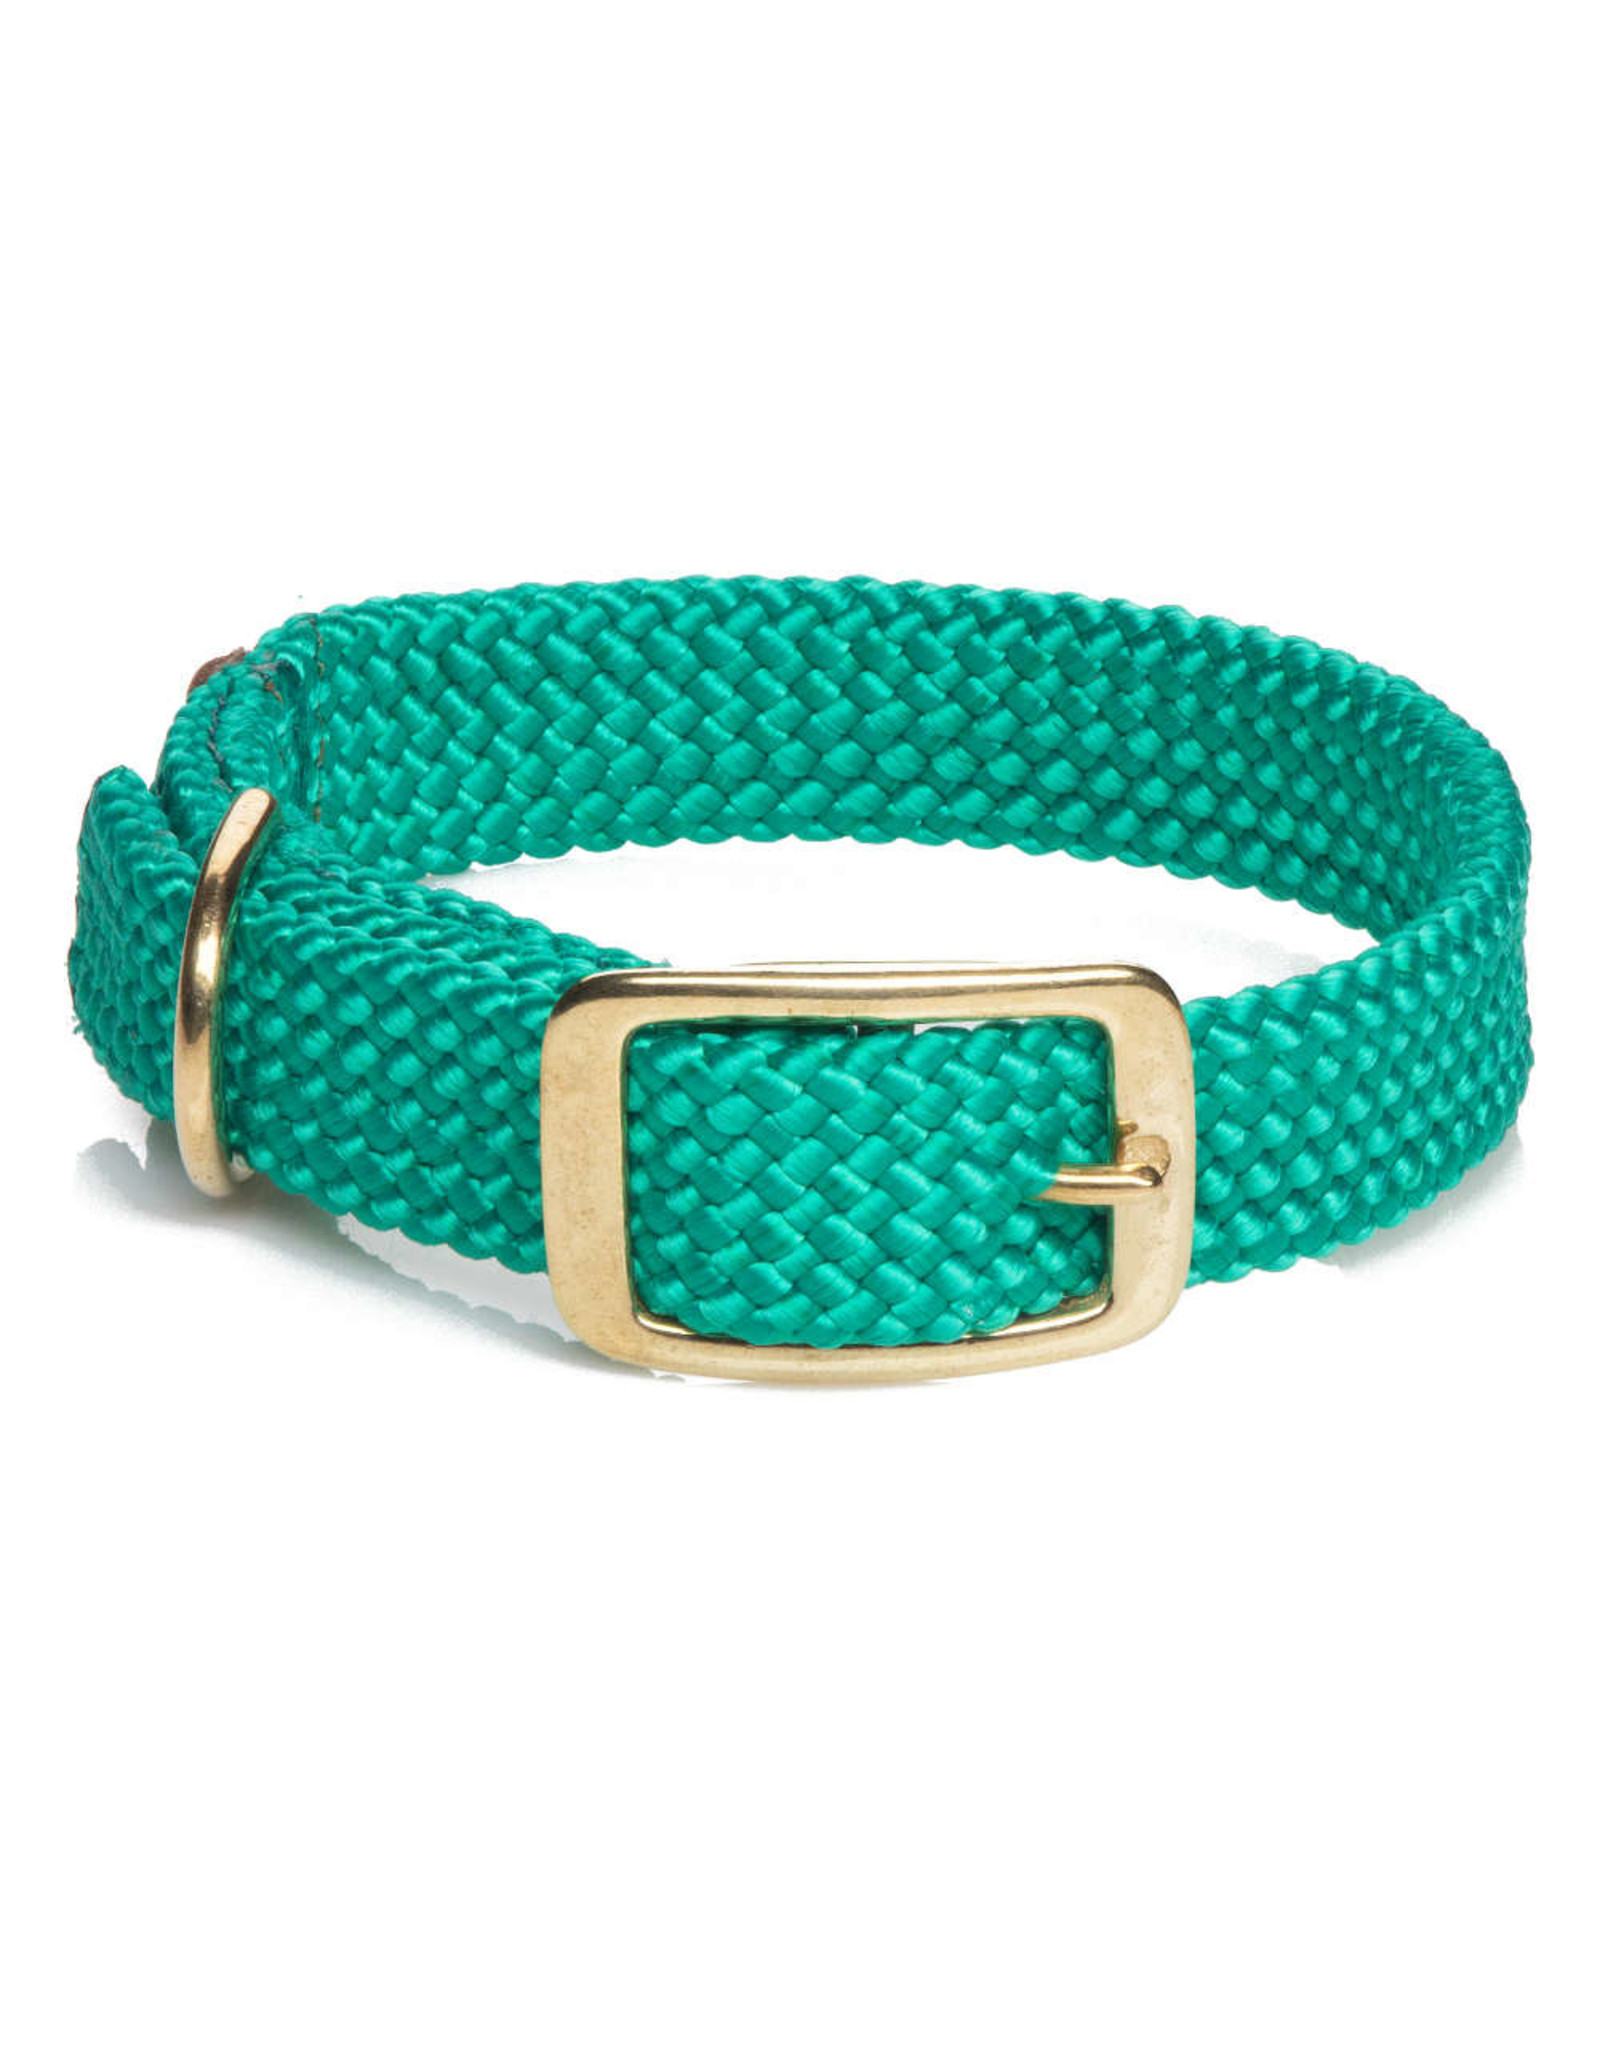 "Mendota Mendota Double-Braid Collar KELLY GREEN 1""x24"""